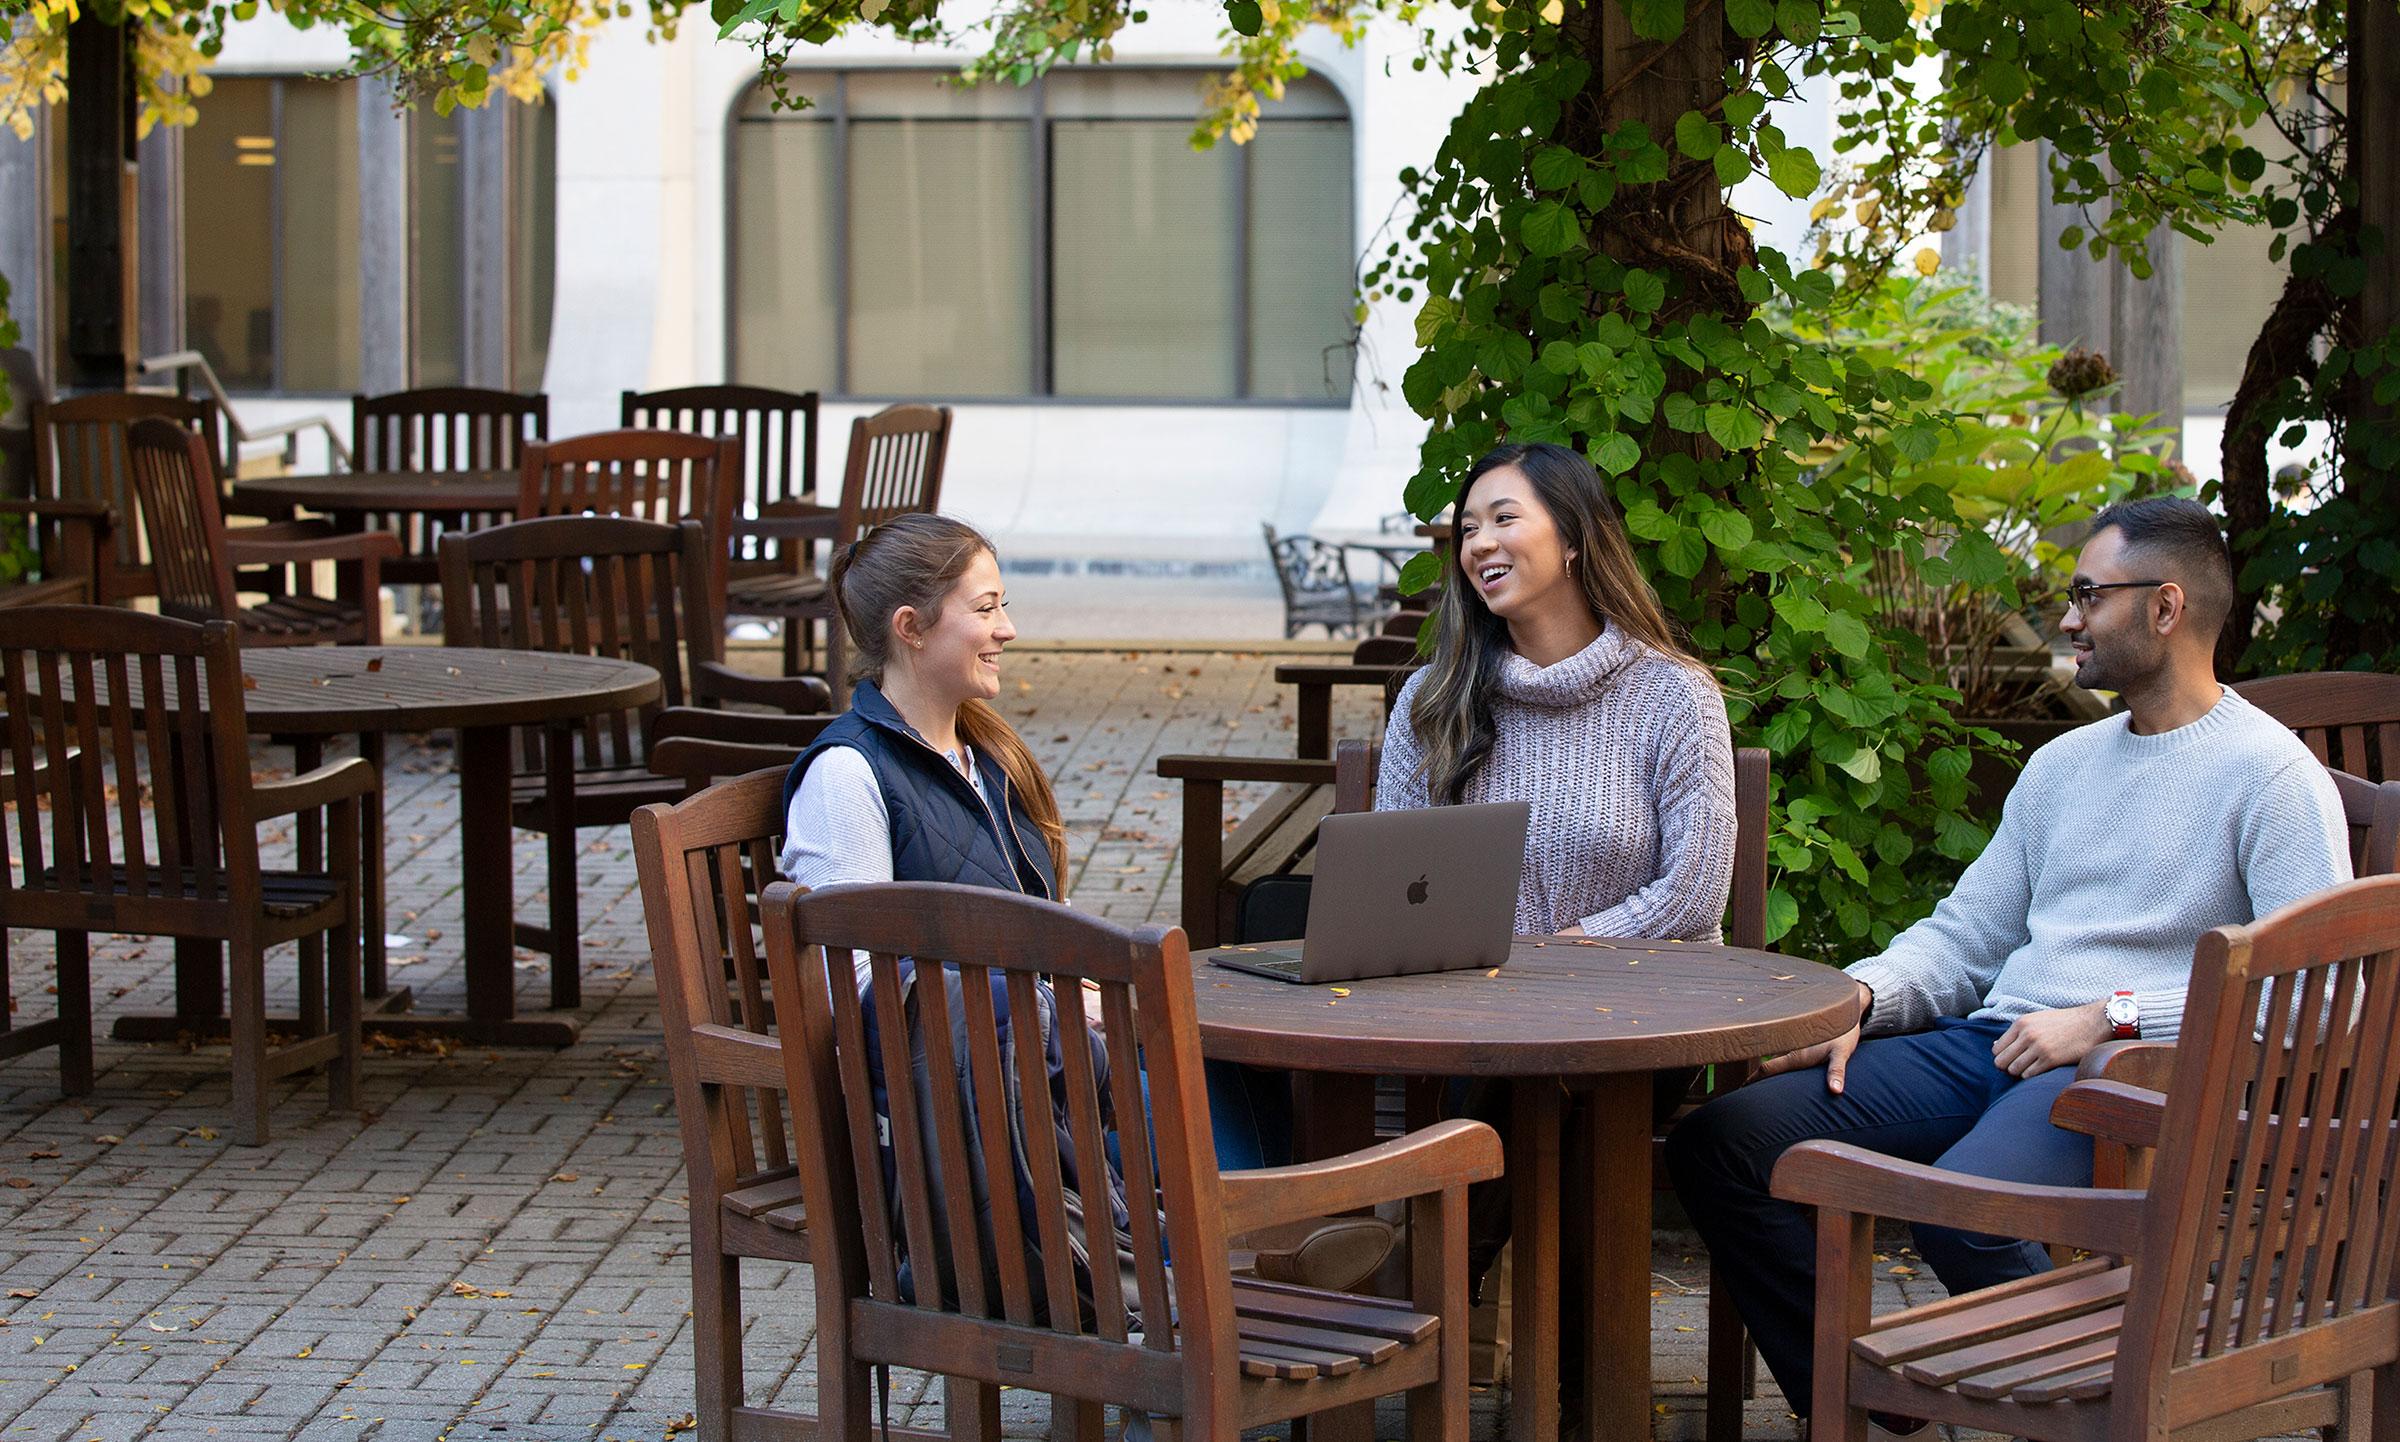 Penn State Academic Calendar 2022.Medical Education Program Academic Calendar Penn State College Of Medicine Current Students